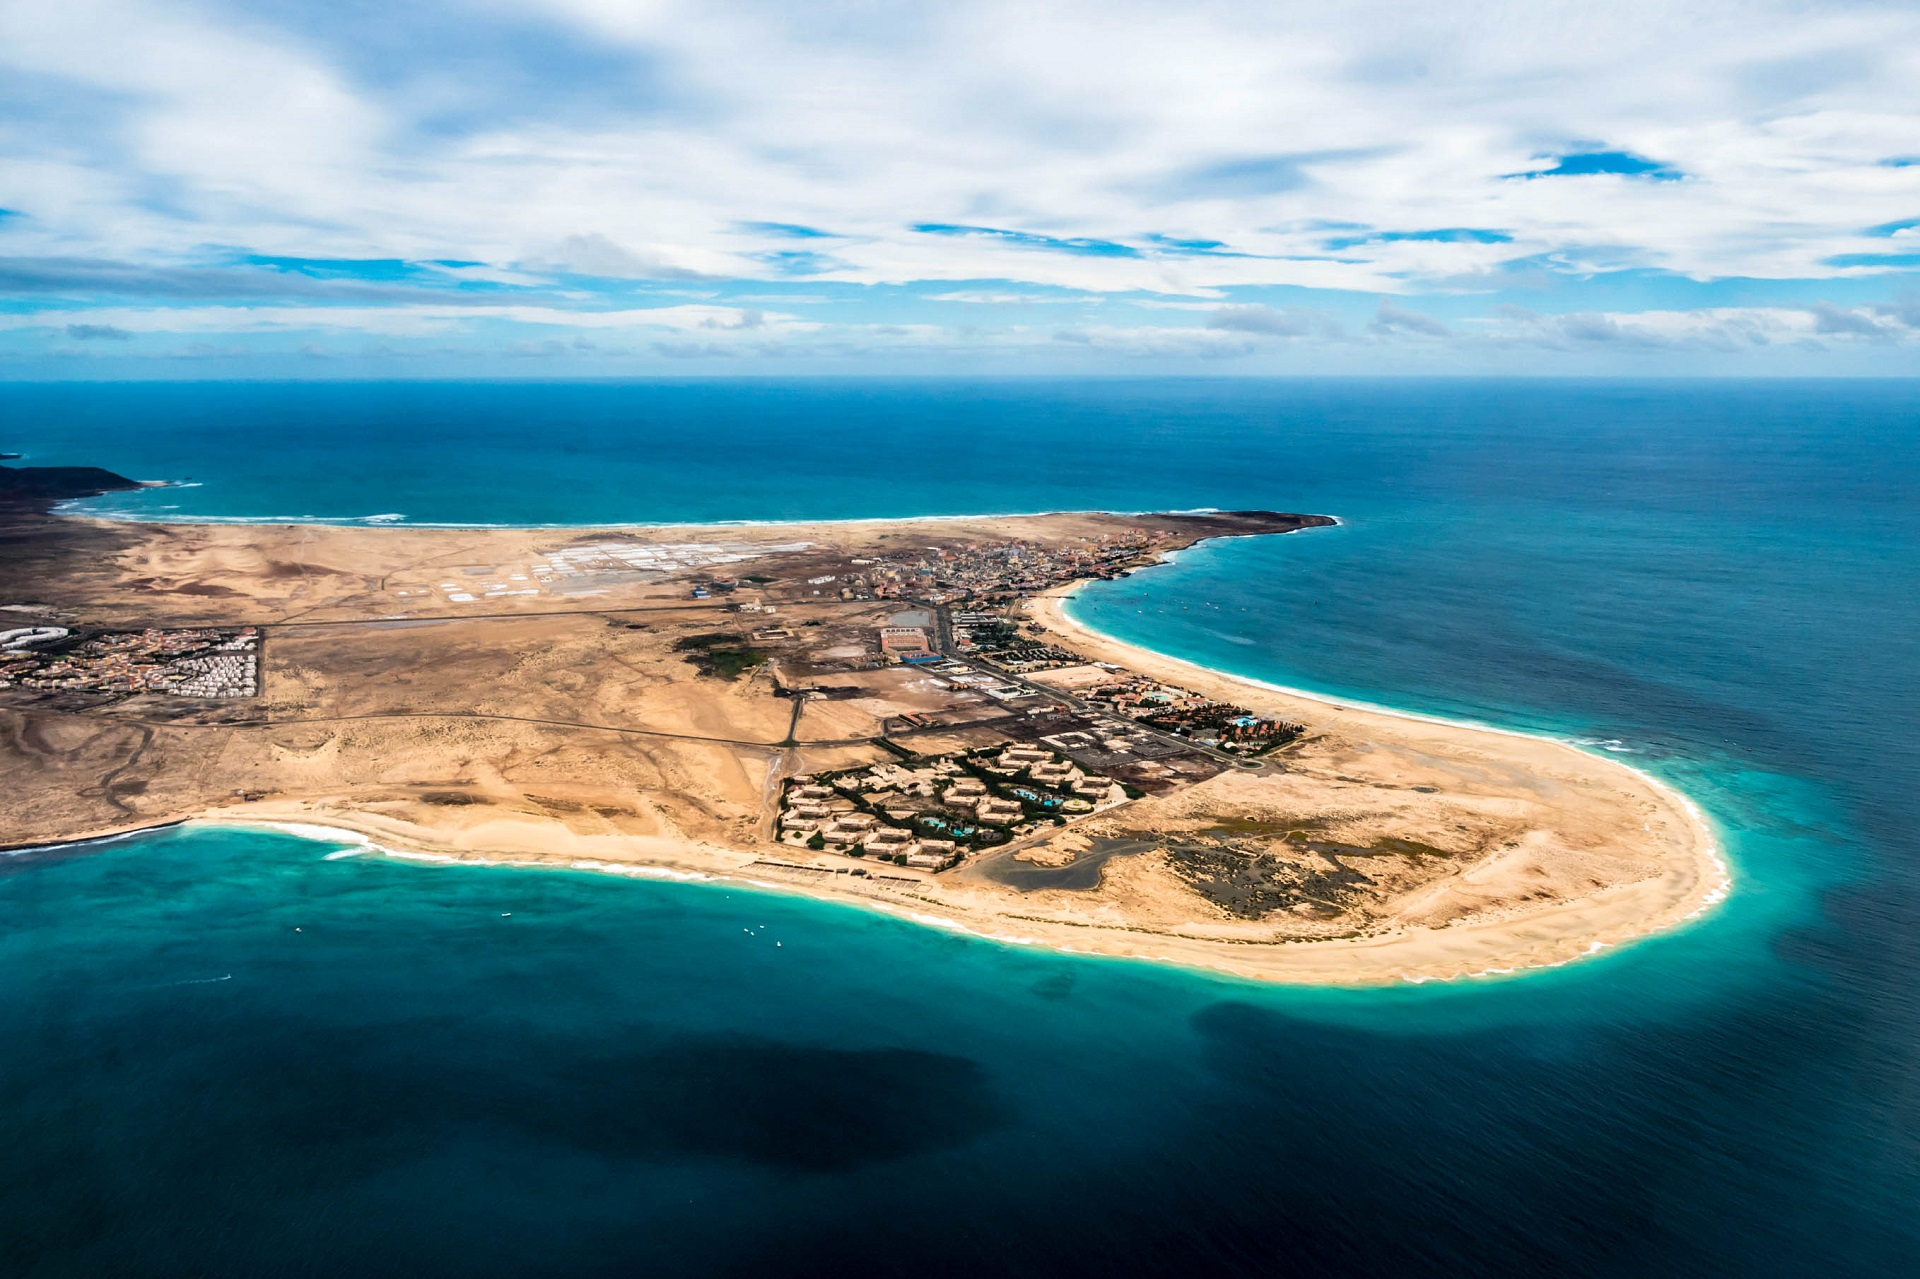 Aerial view of Santa Maria in Sal Island Cape Verde - Cabo Verde